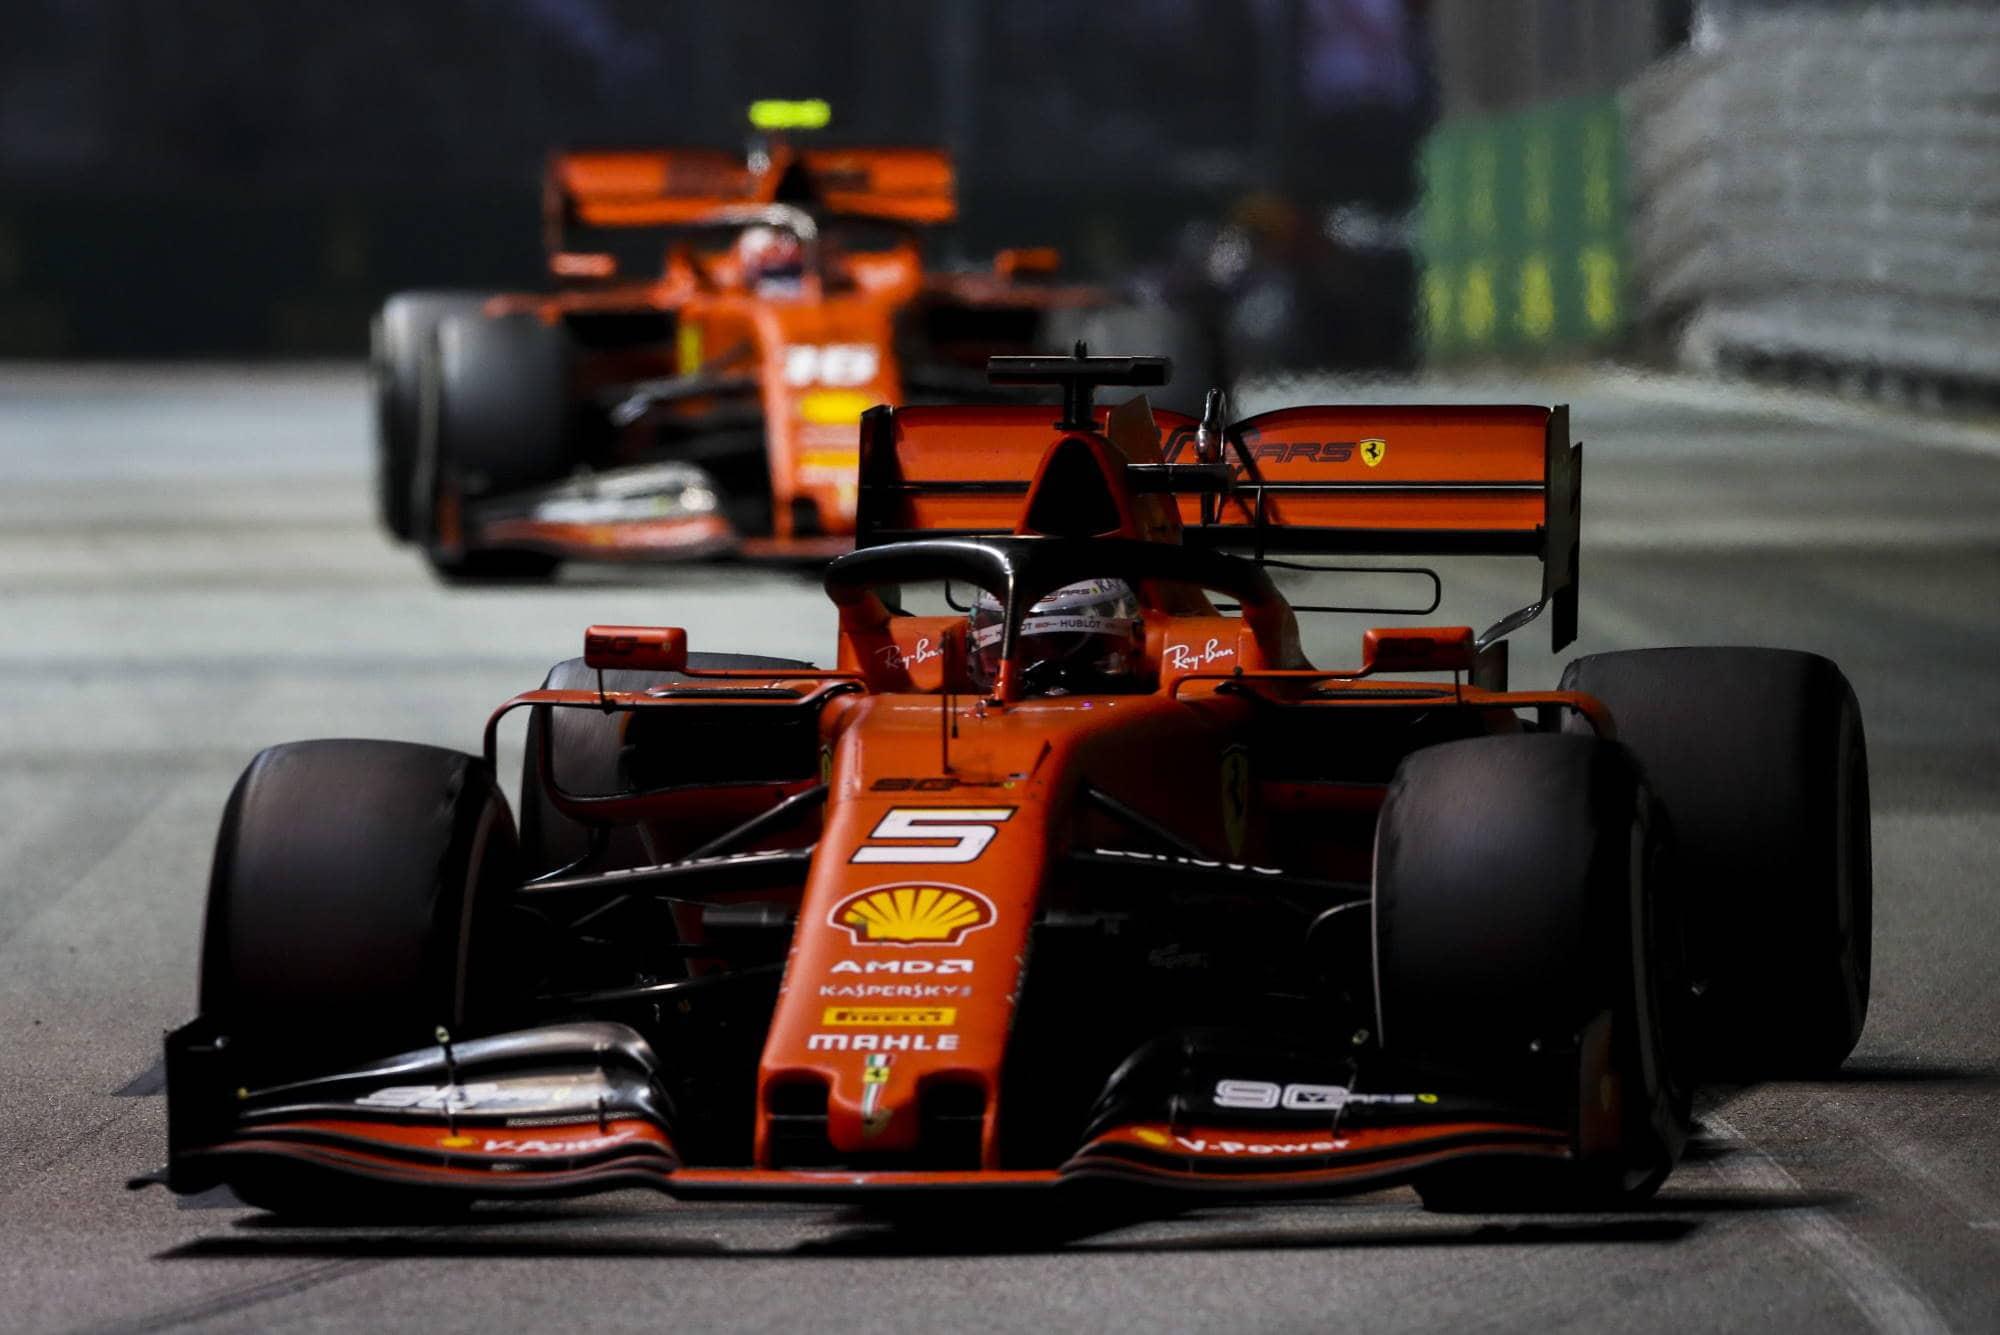 Vettel and Leclerc Singapore GP F1 2019 Race Photo Ferrari